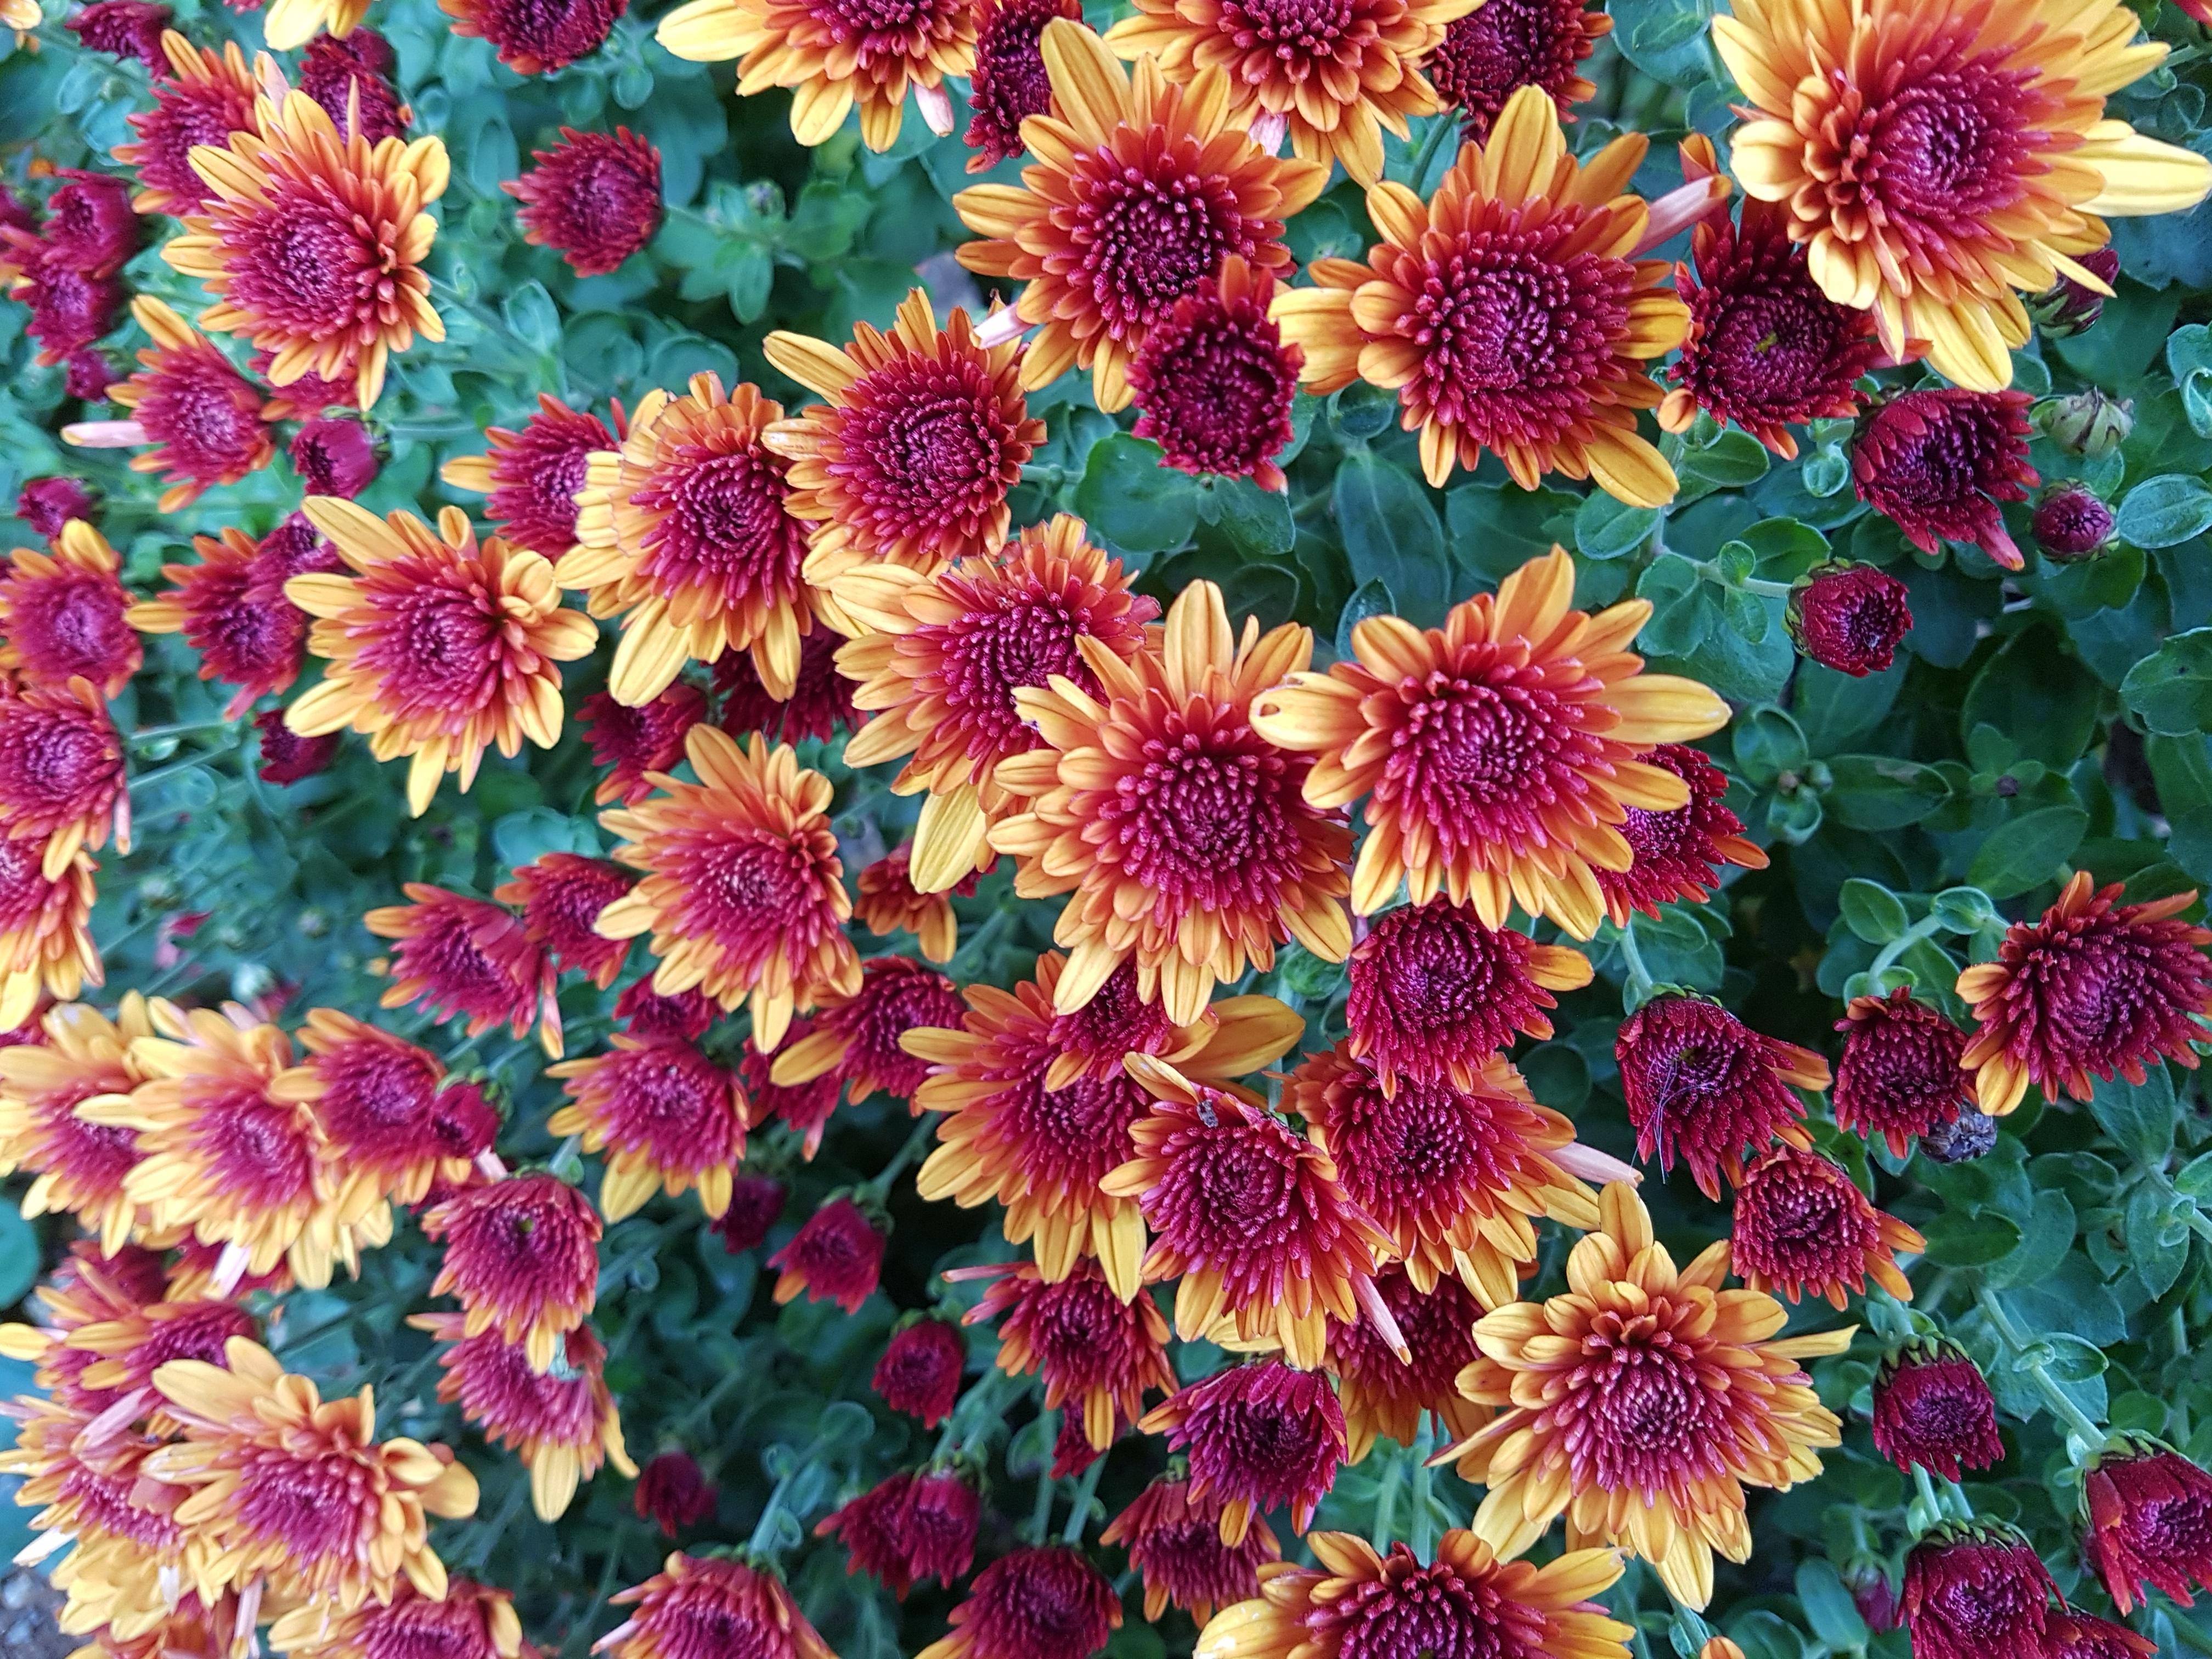 free images : petal, autumn, botany, flora, chrysanthemum, floristry